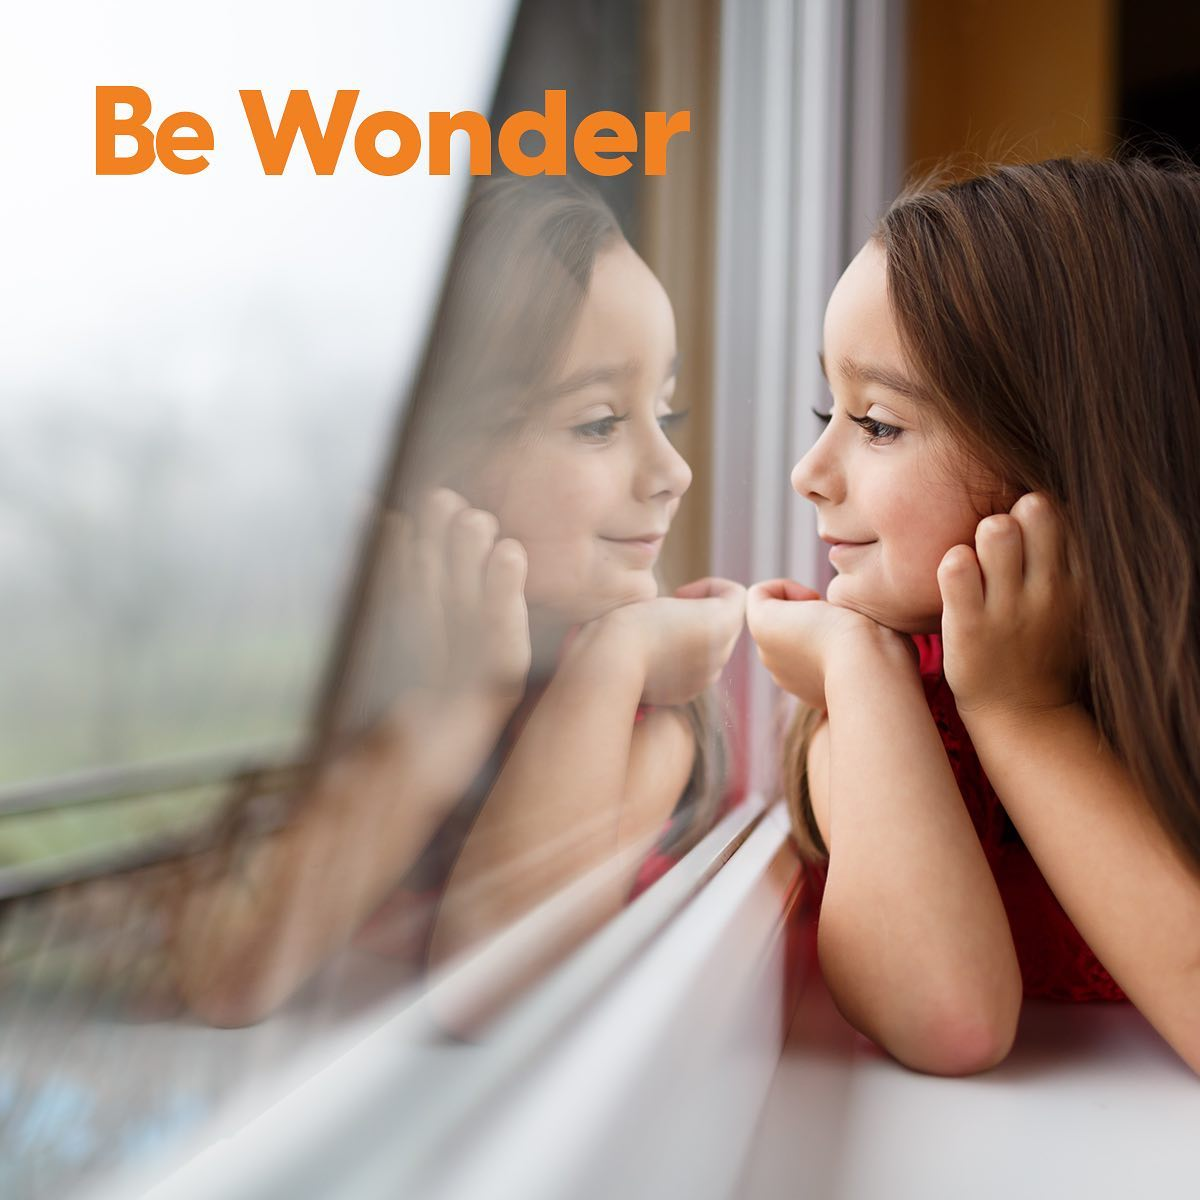 Doctor's Best Be Wonder